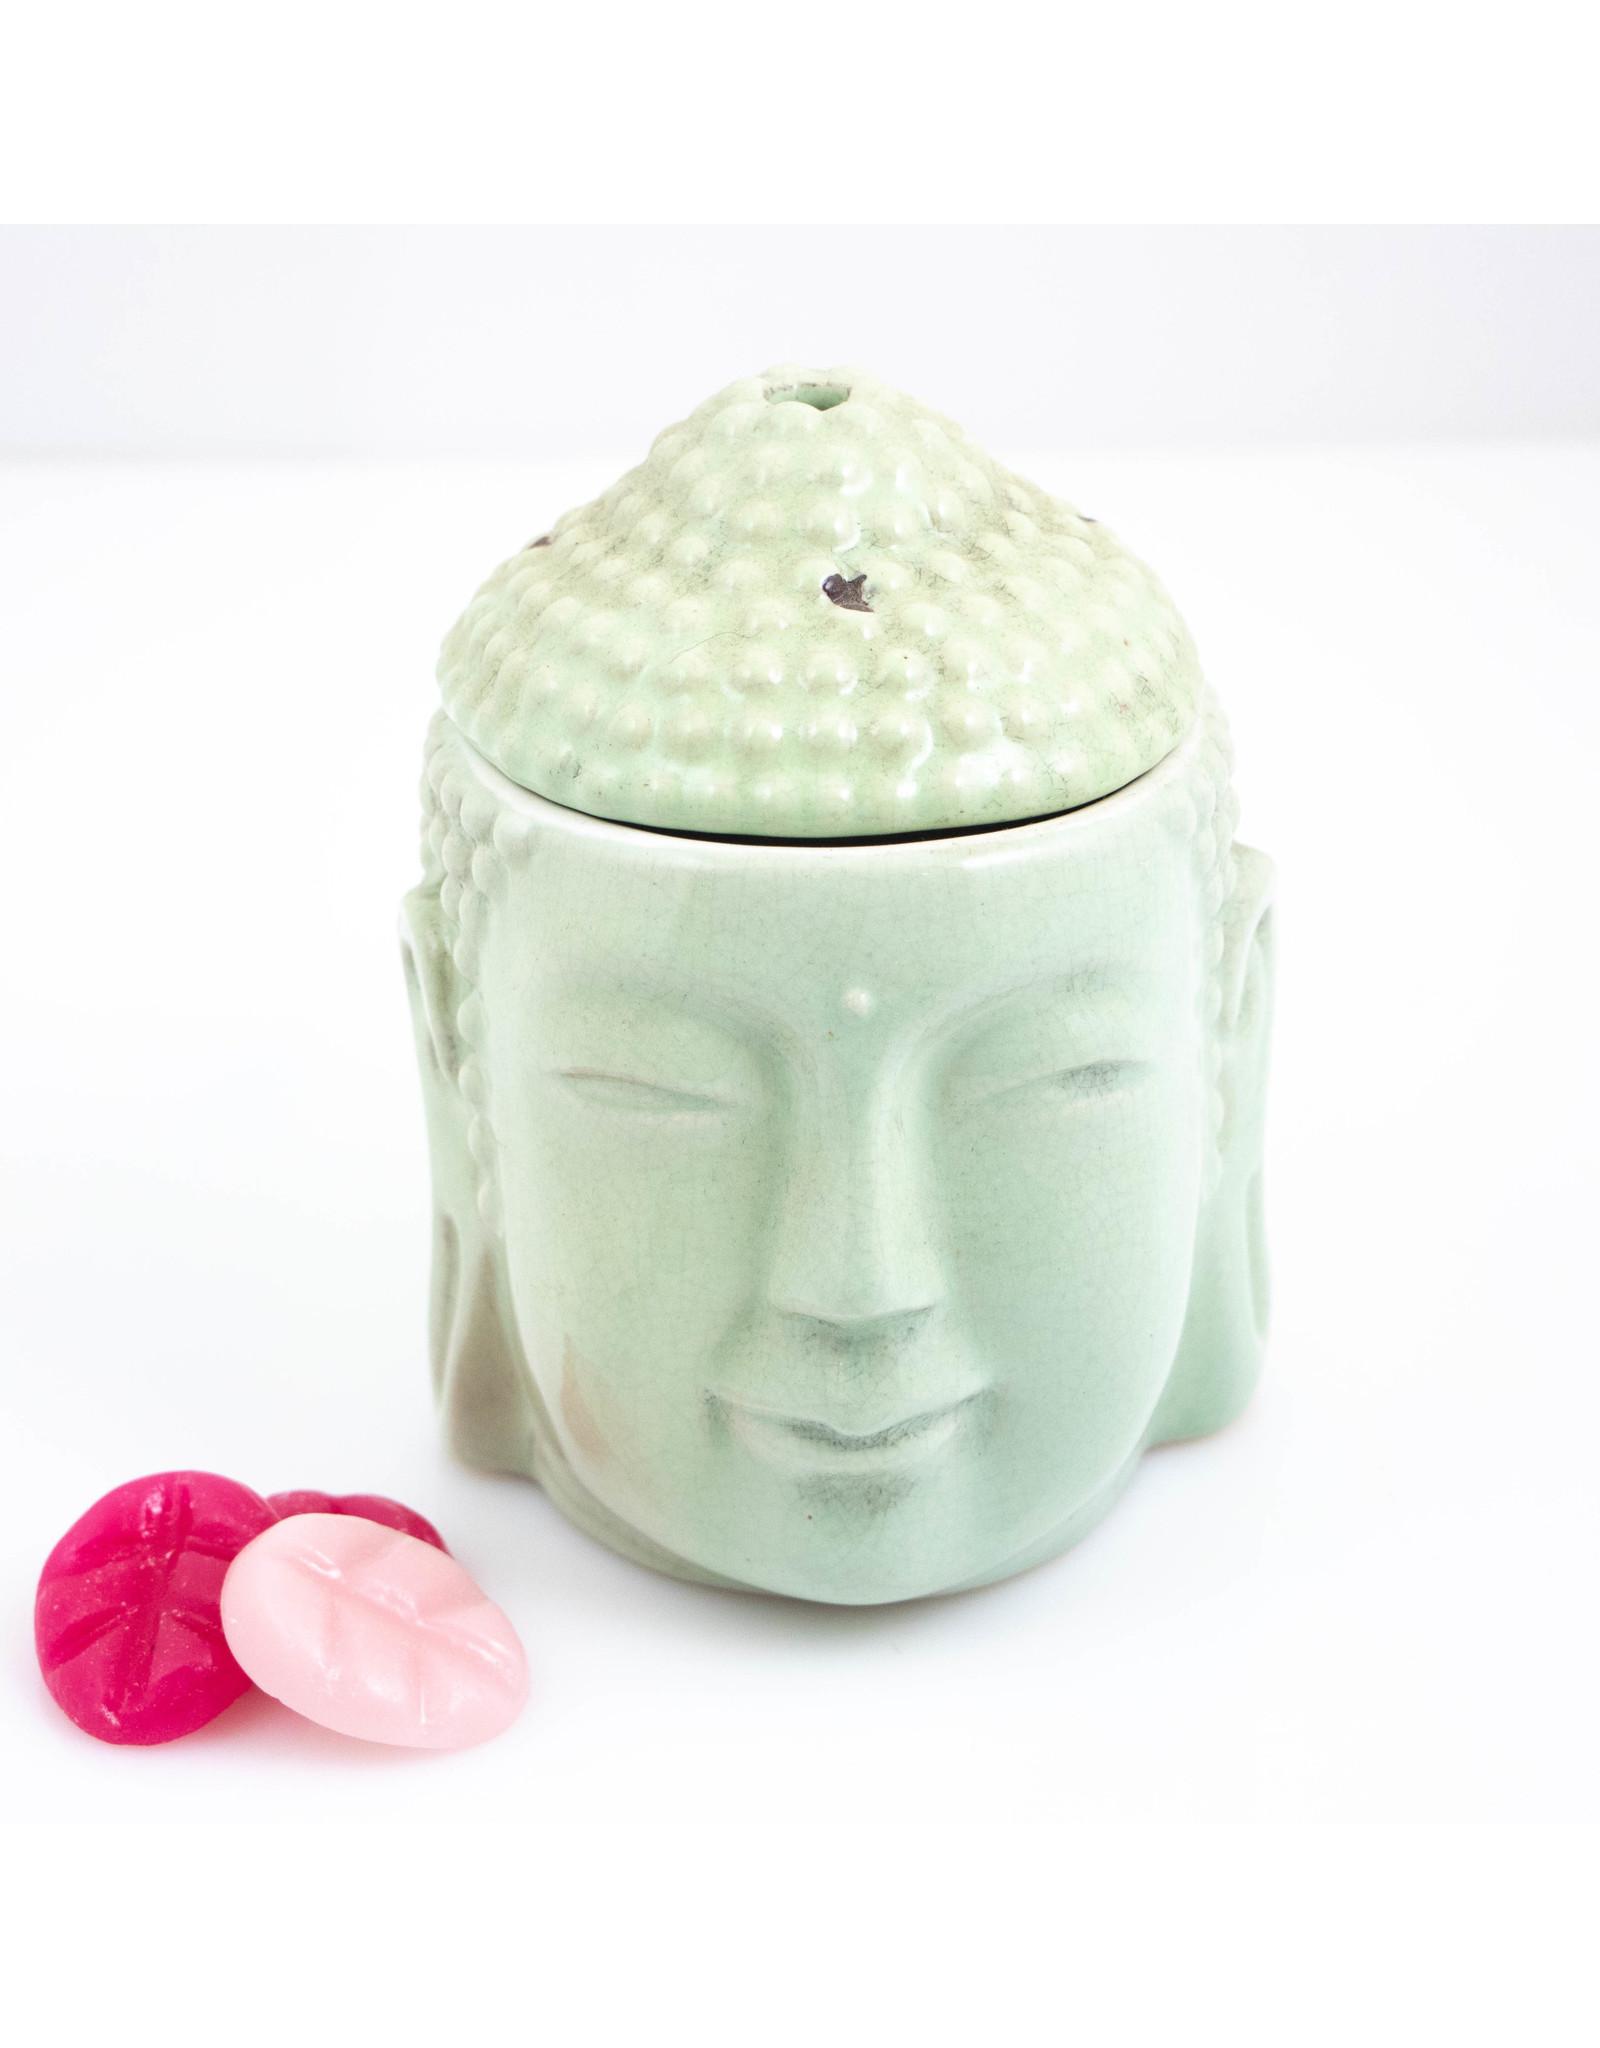 ScentBurner Buddha Head Olive